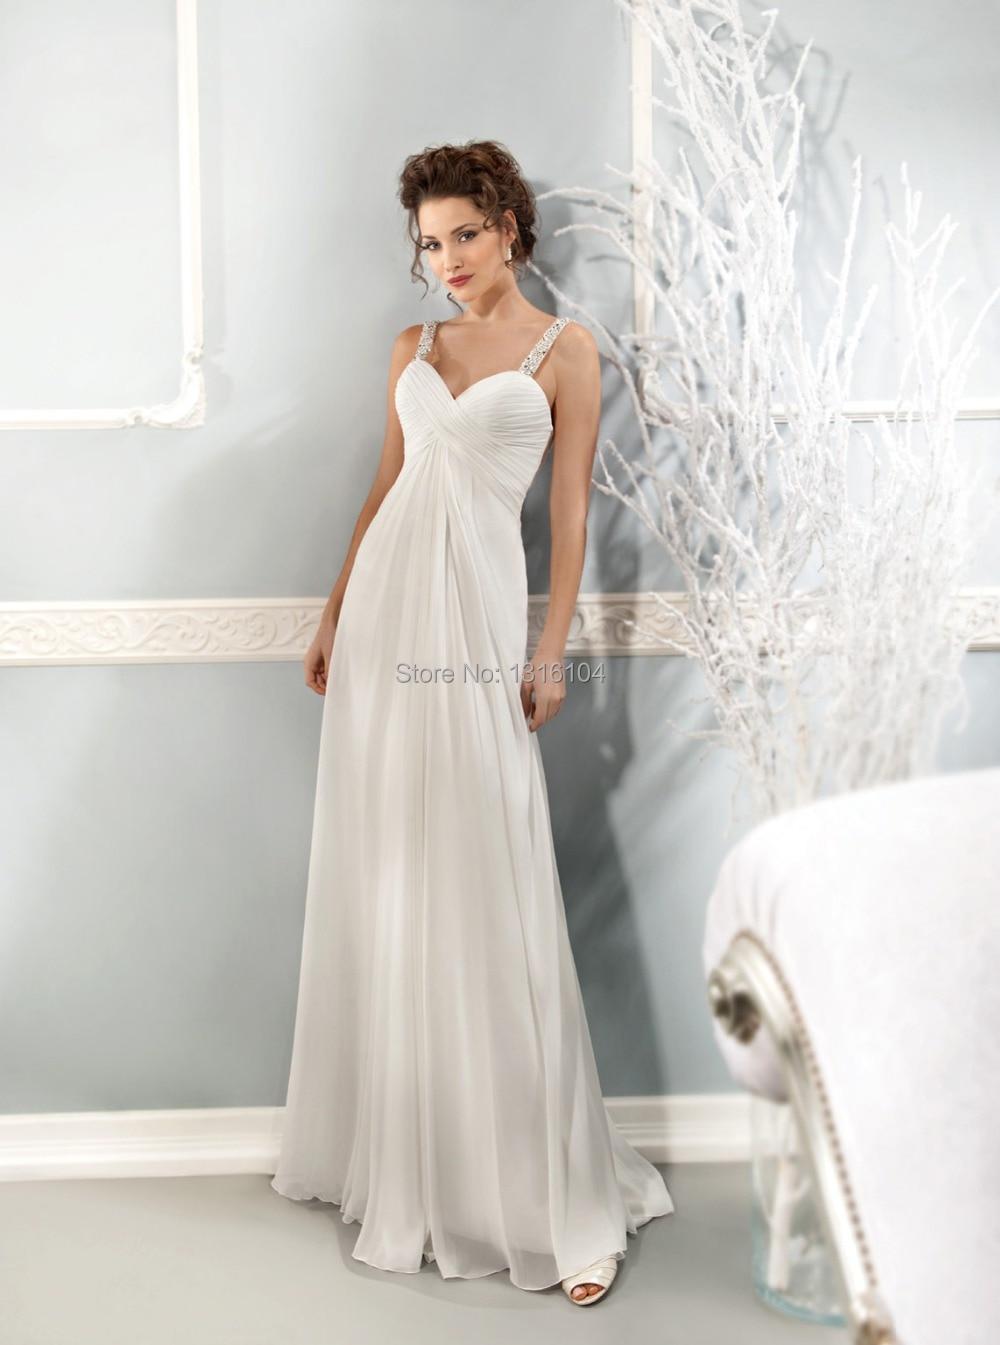 maternity casual wedding dress » Wedding Dresses Designs, Ideas and ...